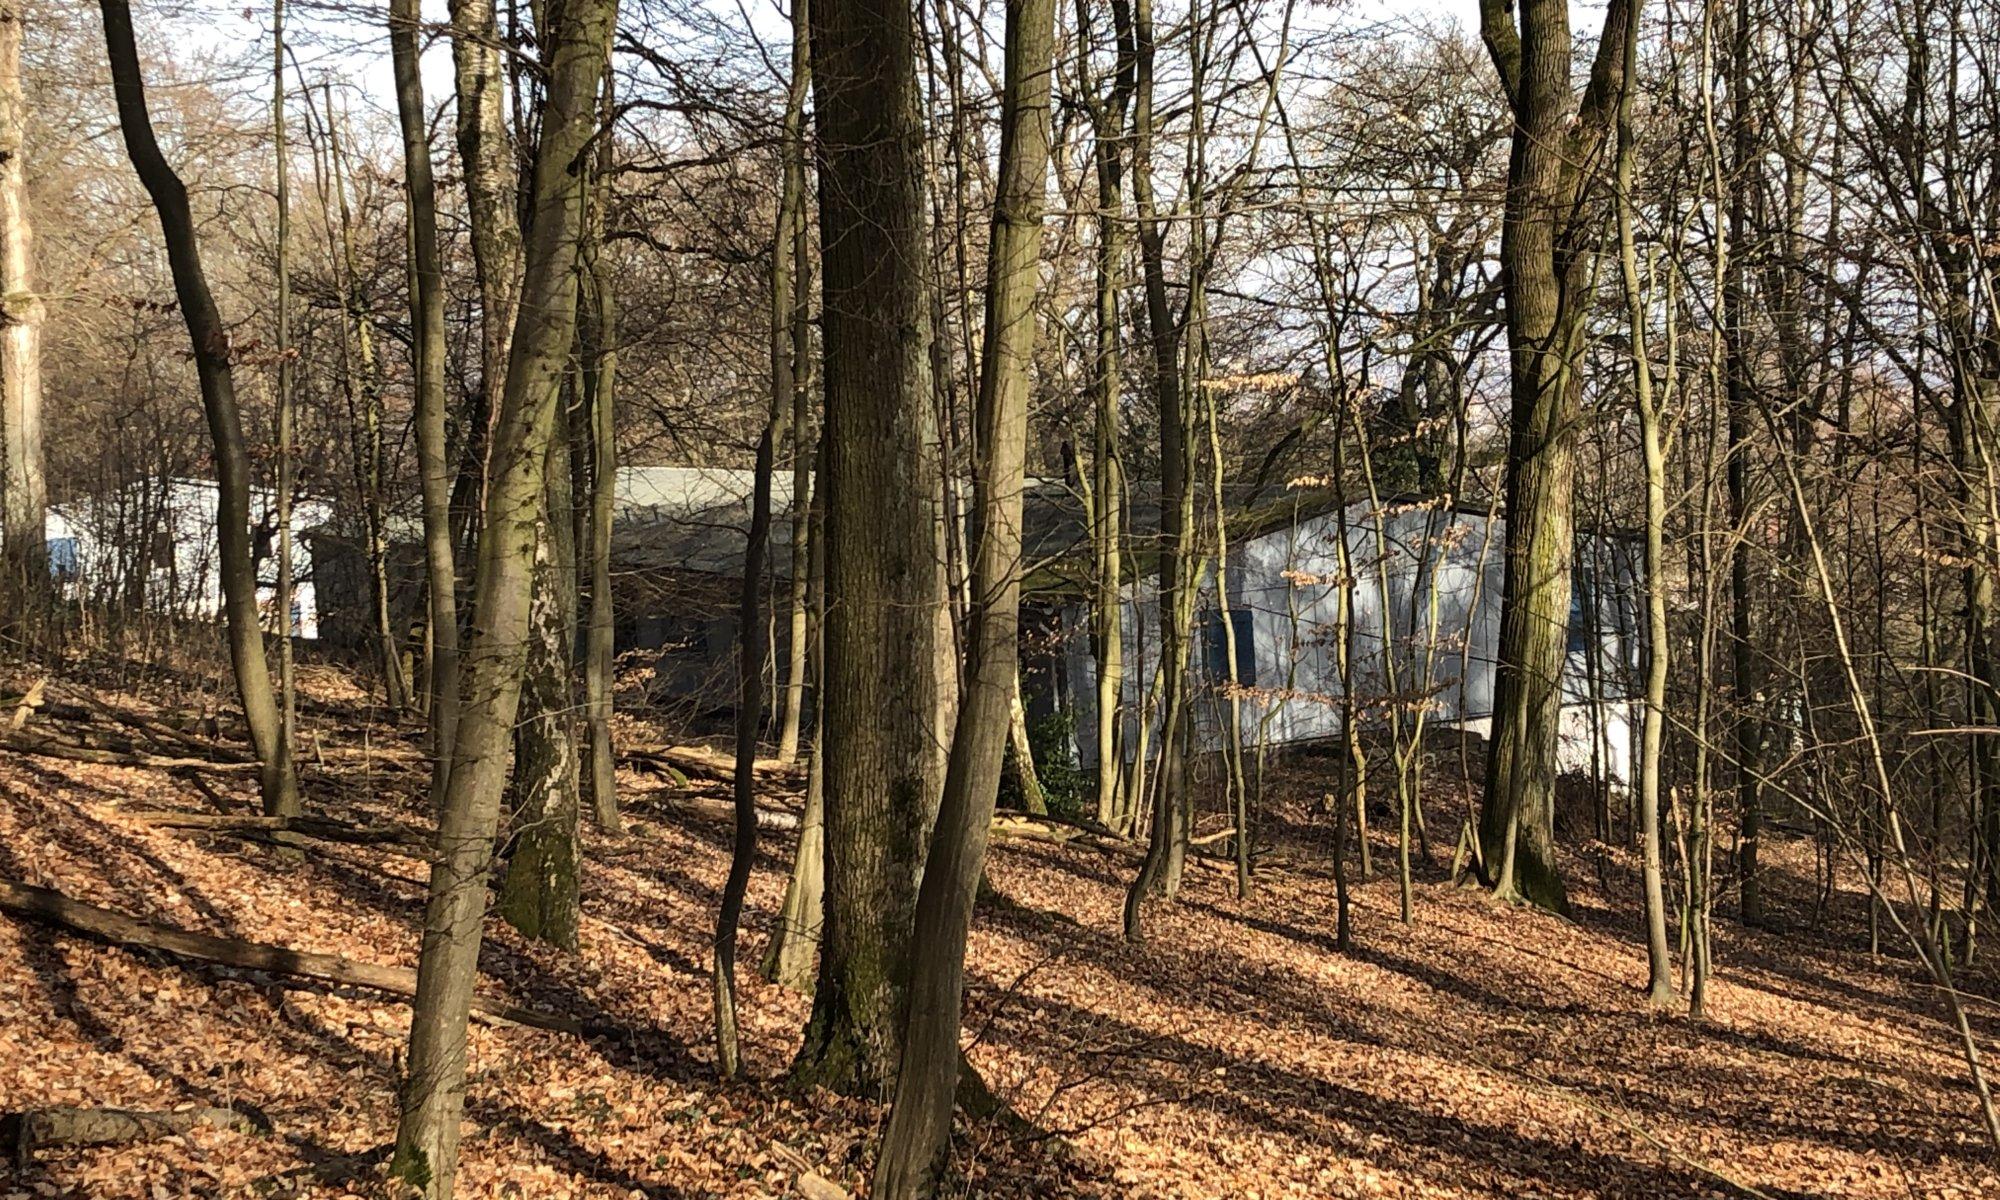 Barracks, Mulang, Kassel